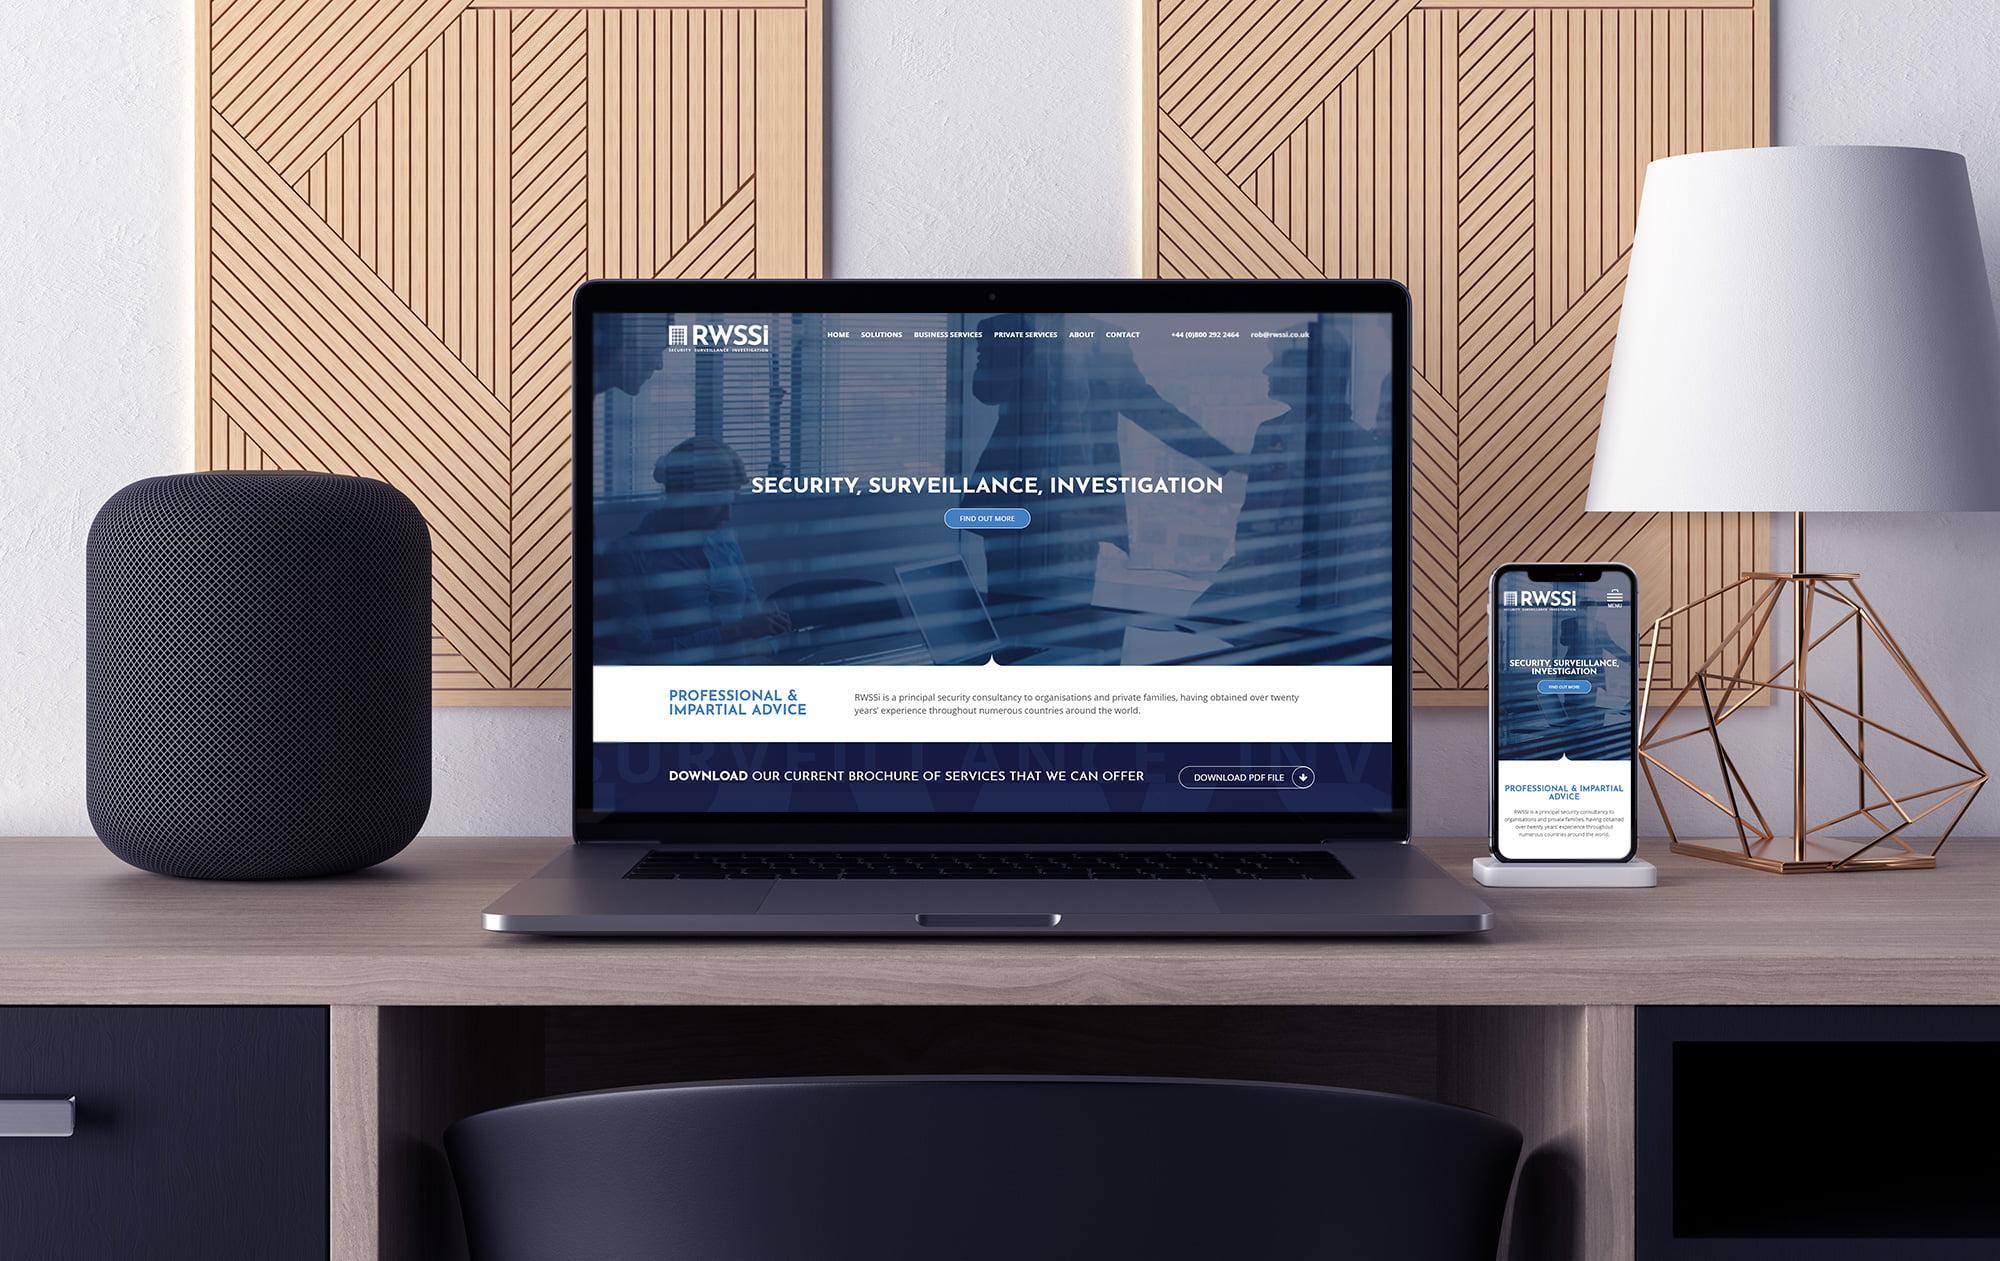 RWSSI website viewed on laptop